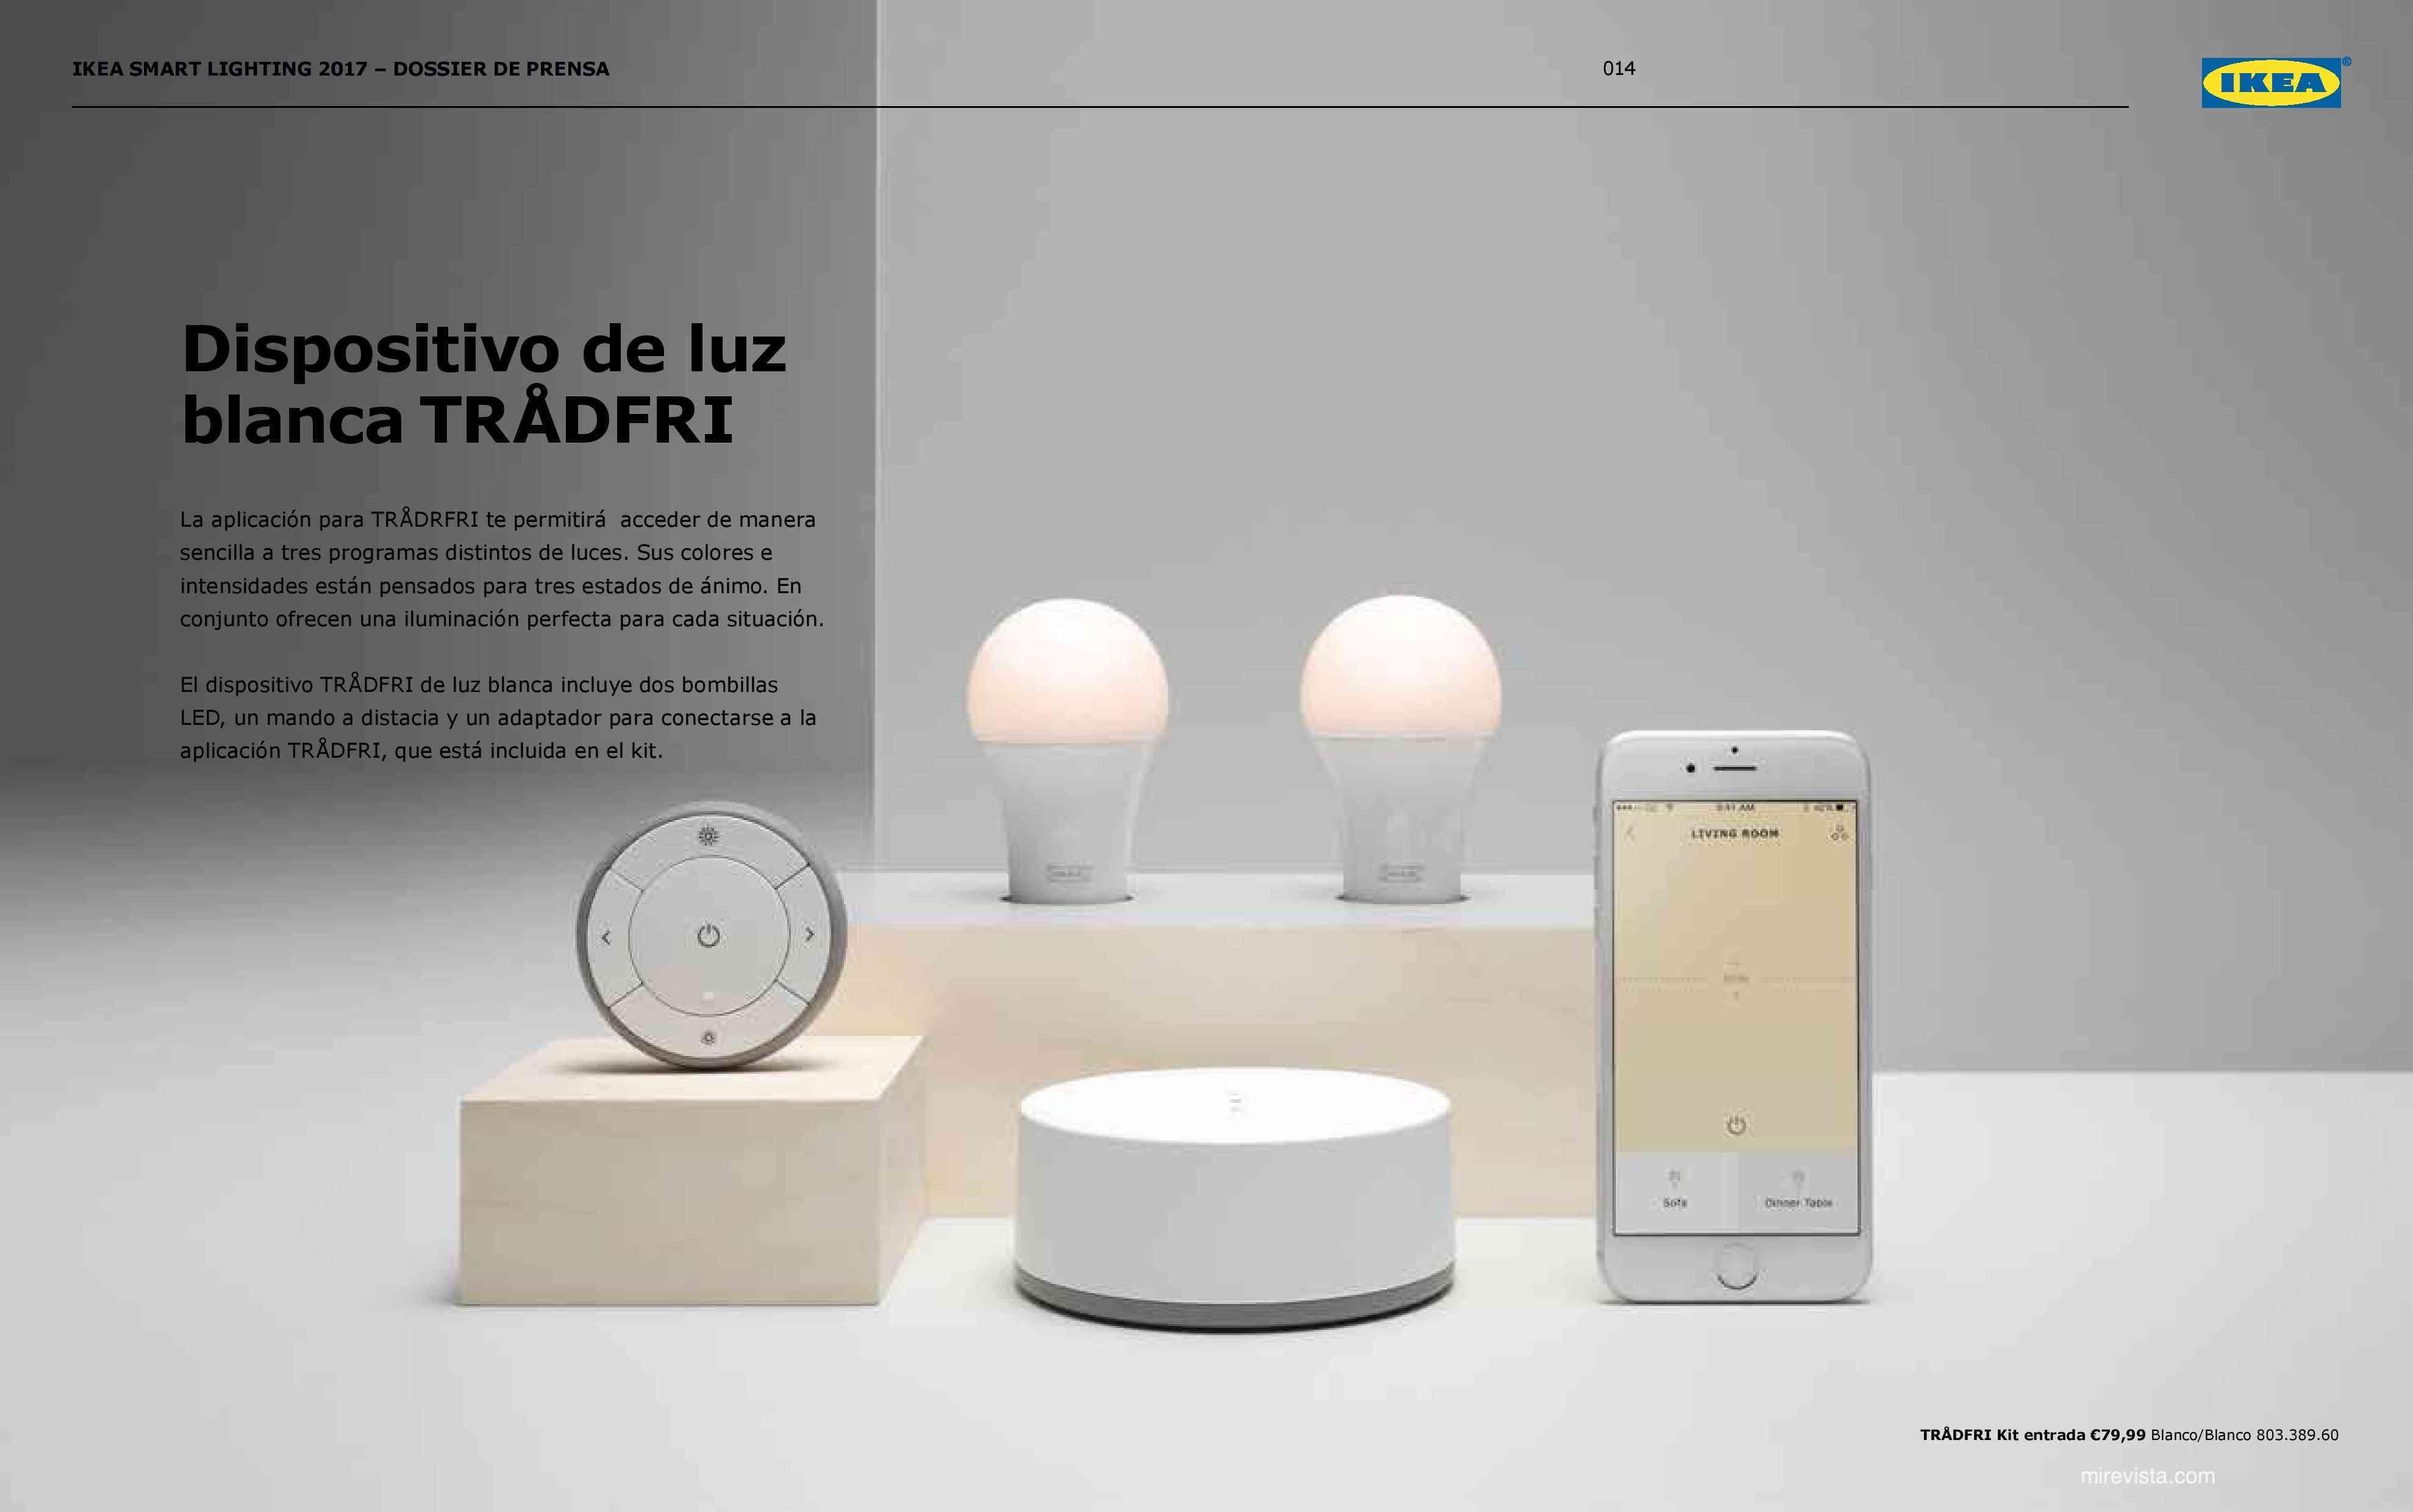 Novedades en iluminación de casas inteligentes con IKEA 70